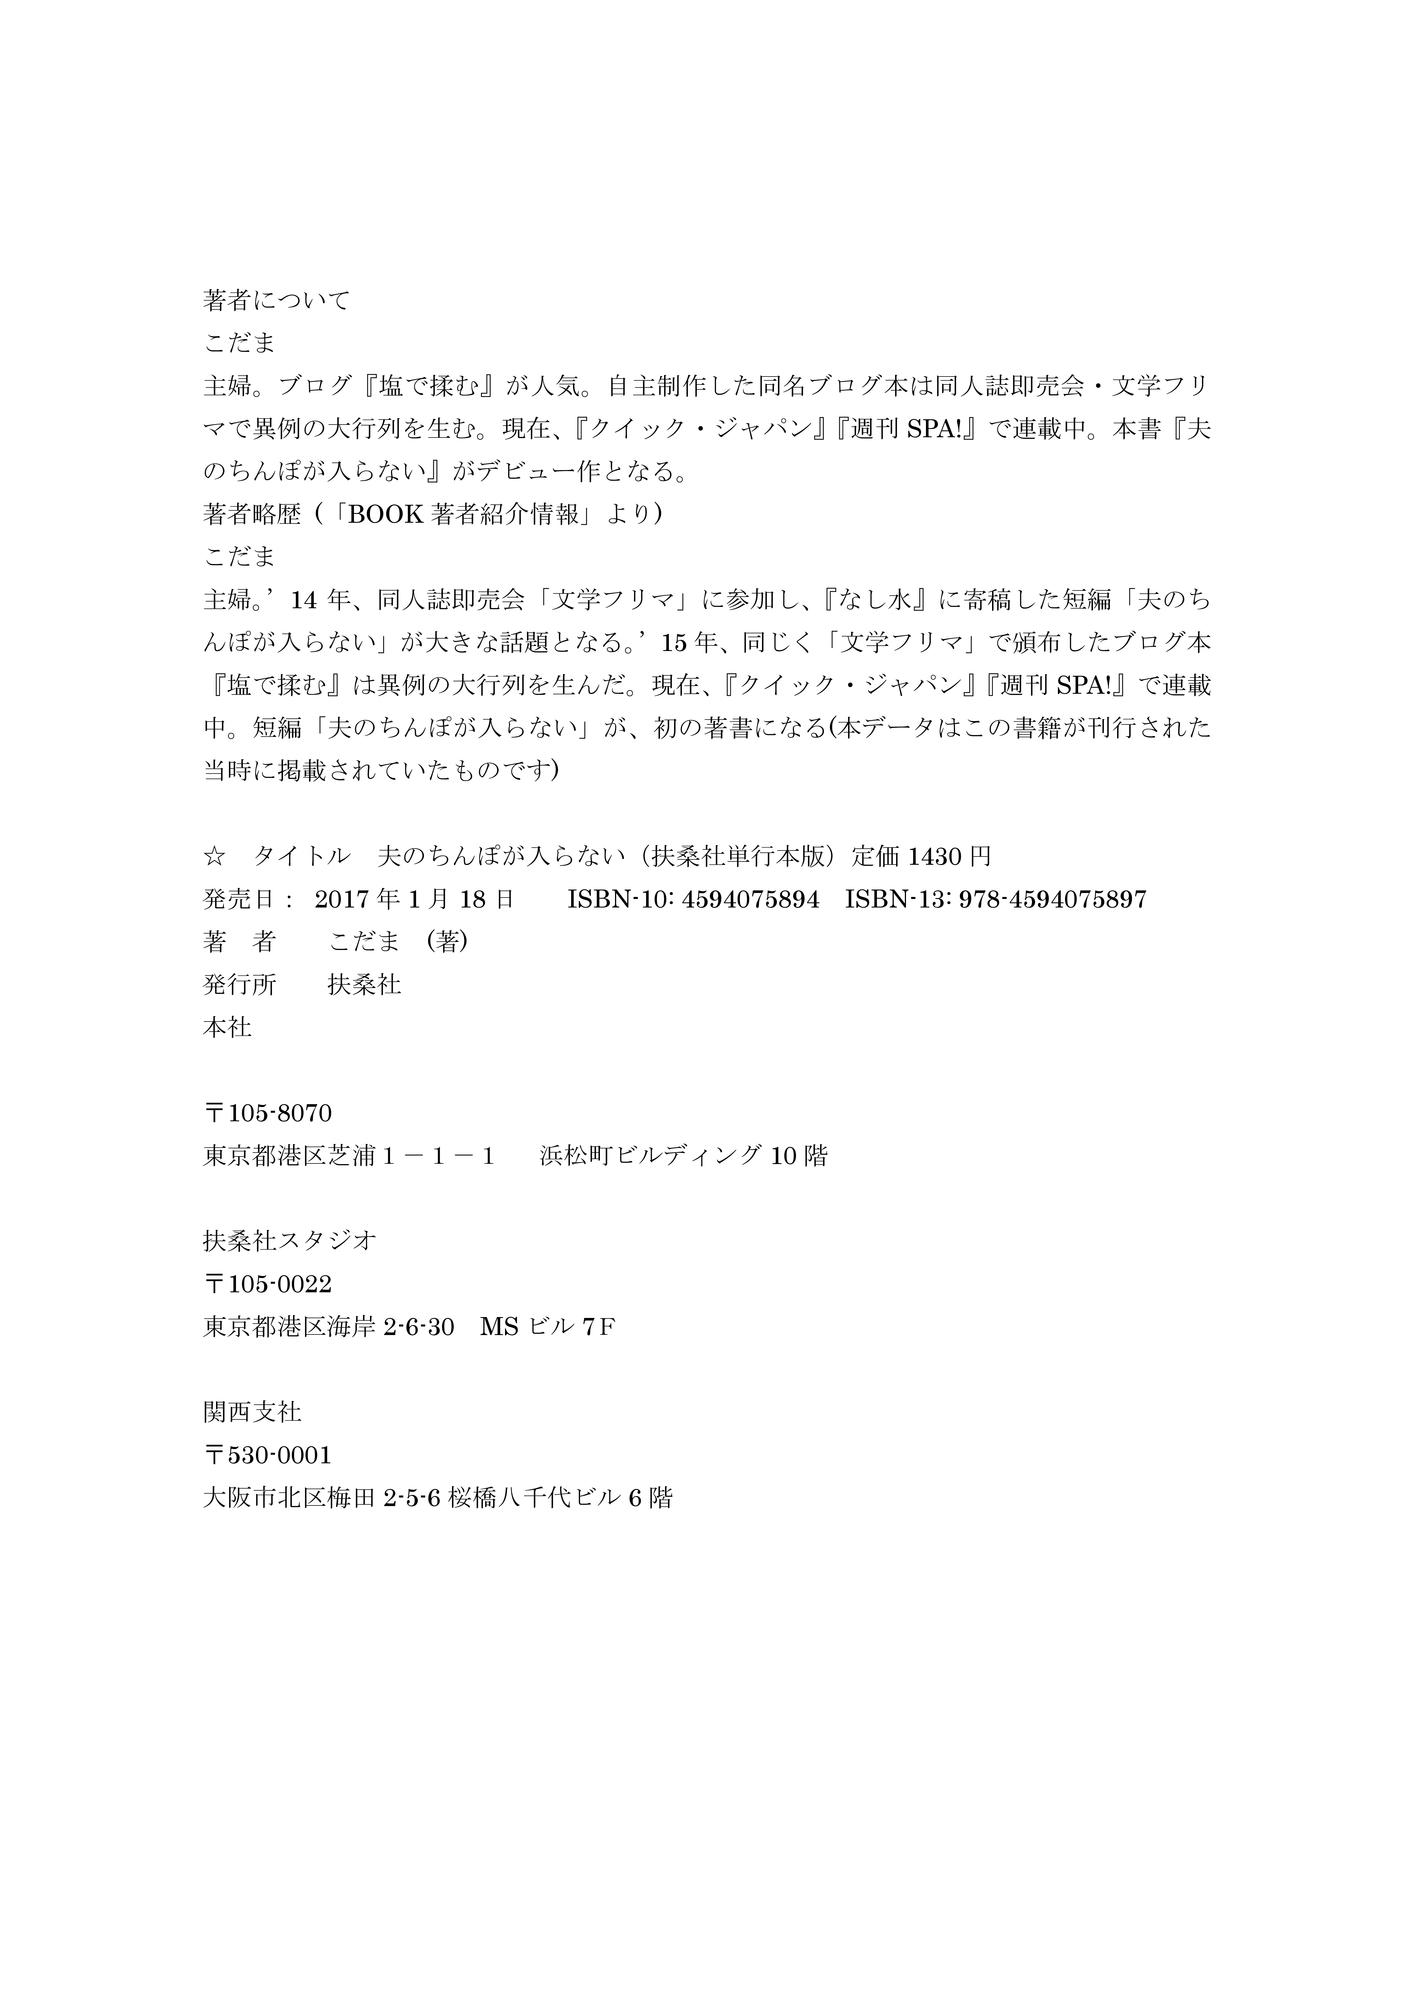 Microsoft Word - 文書 1.png